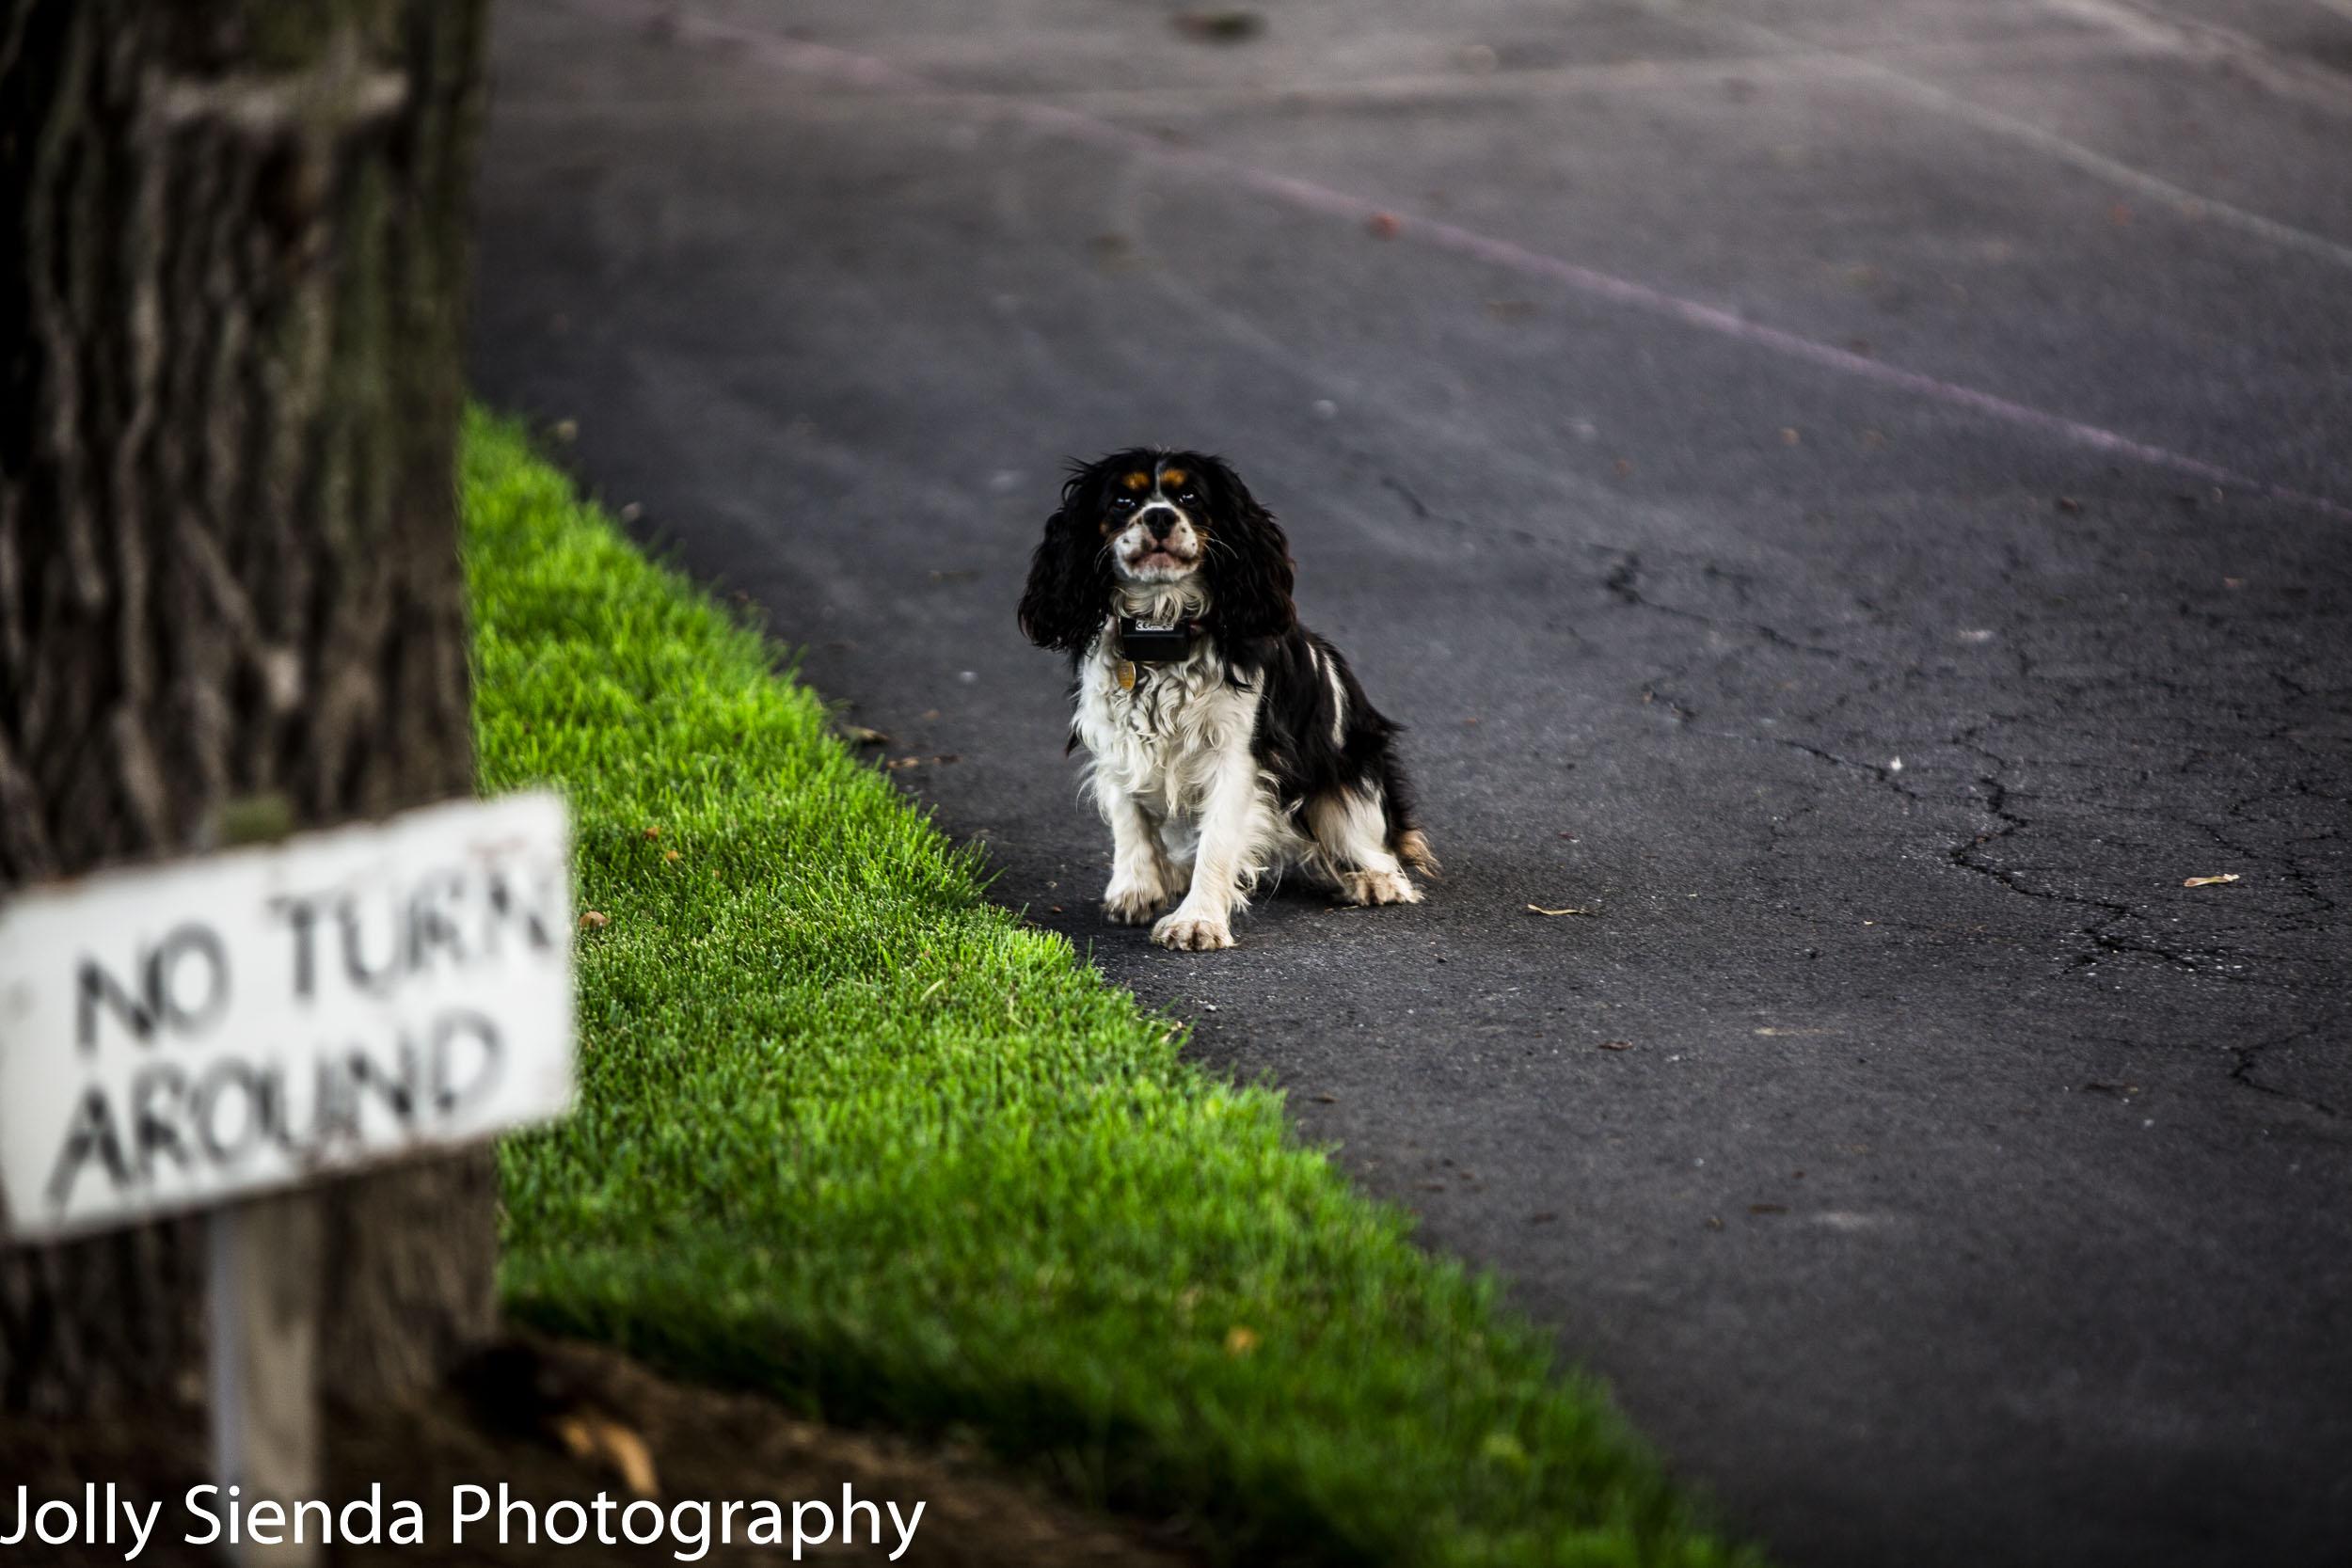 No Turn Around for the Cocker Spaniel Dog